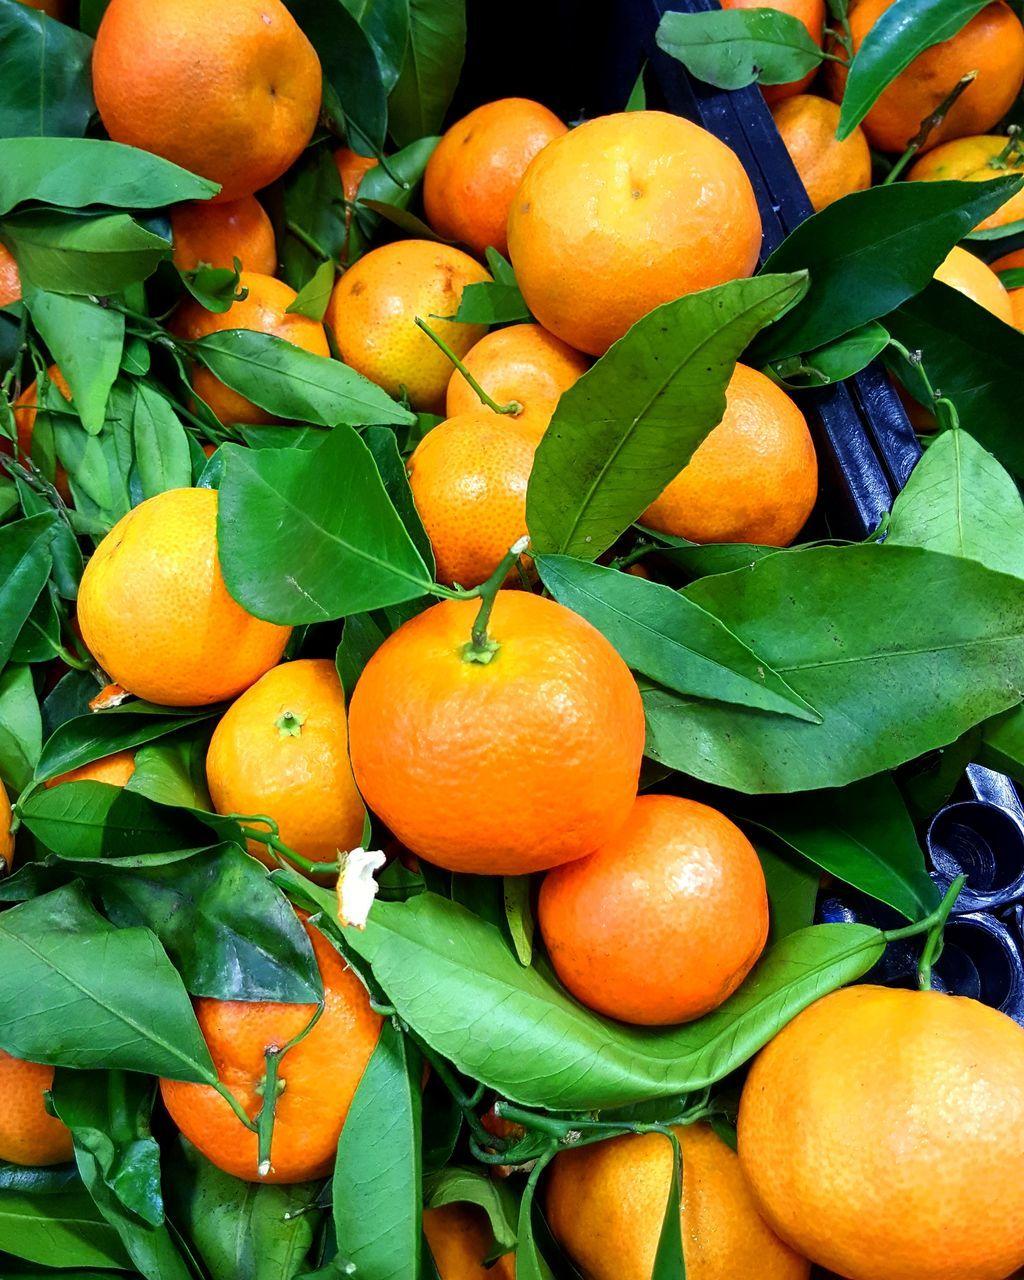 leaf, fruit, orange - fruit, orange color, freshness, food and drink, citrus fruit, green color, orange tree, healthy eating, food, day, growth, no people, outdoors, close-up, nature, tree